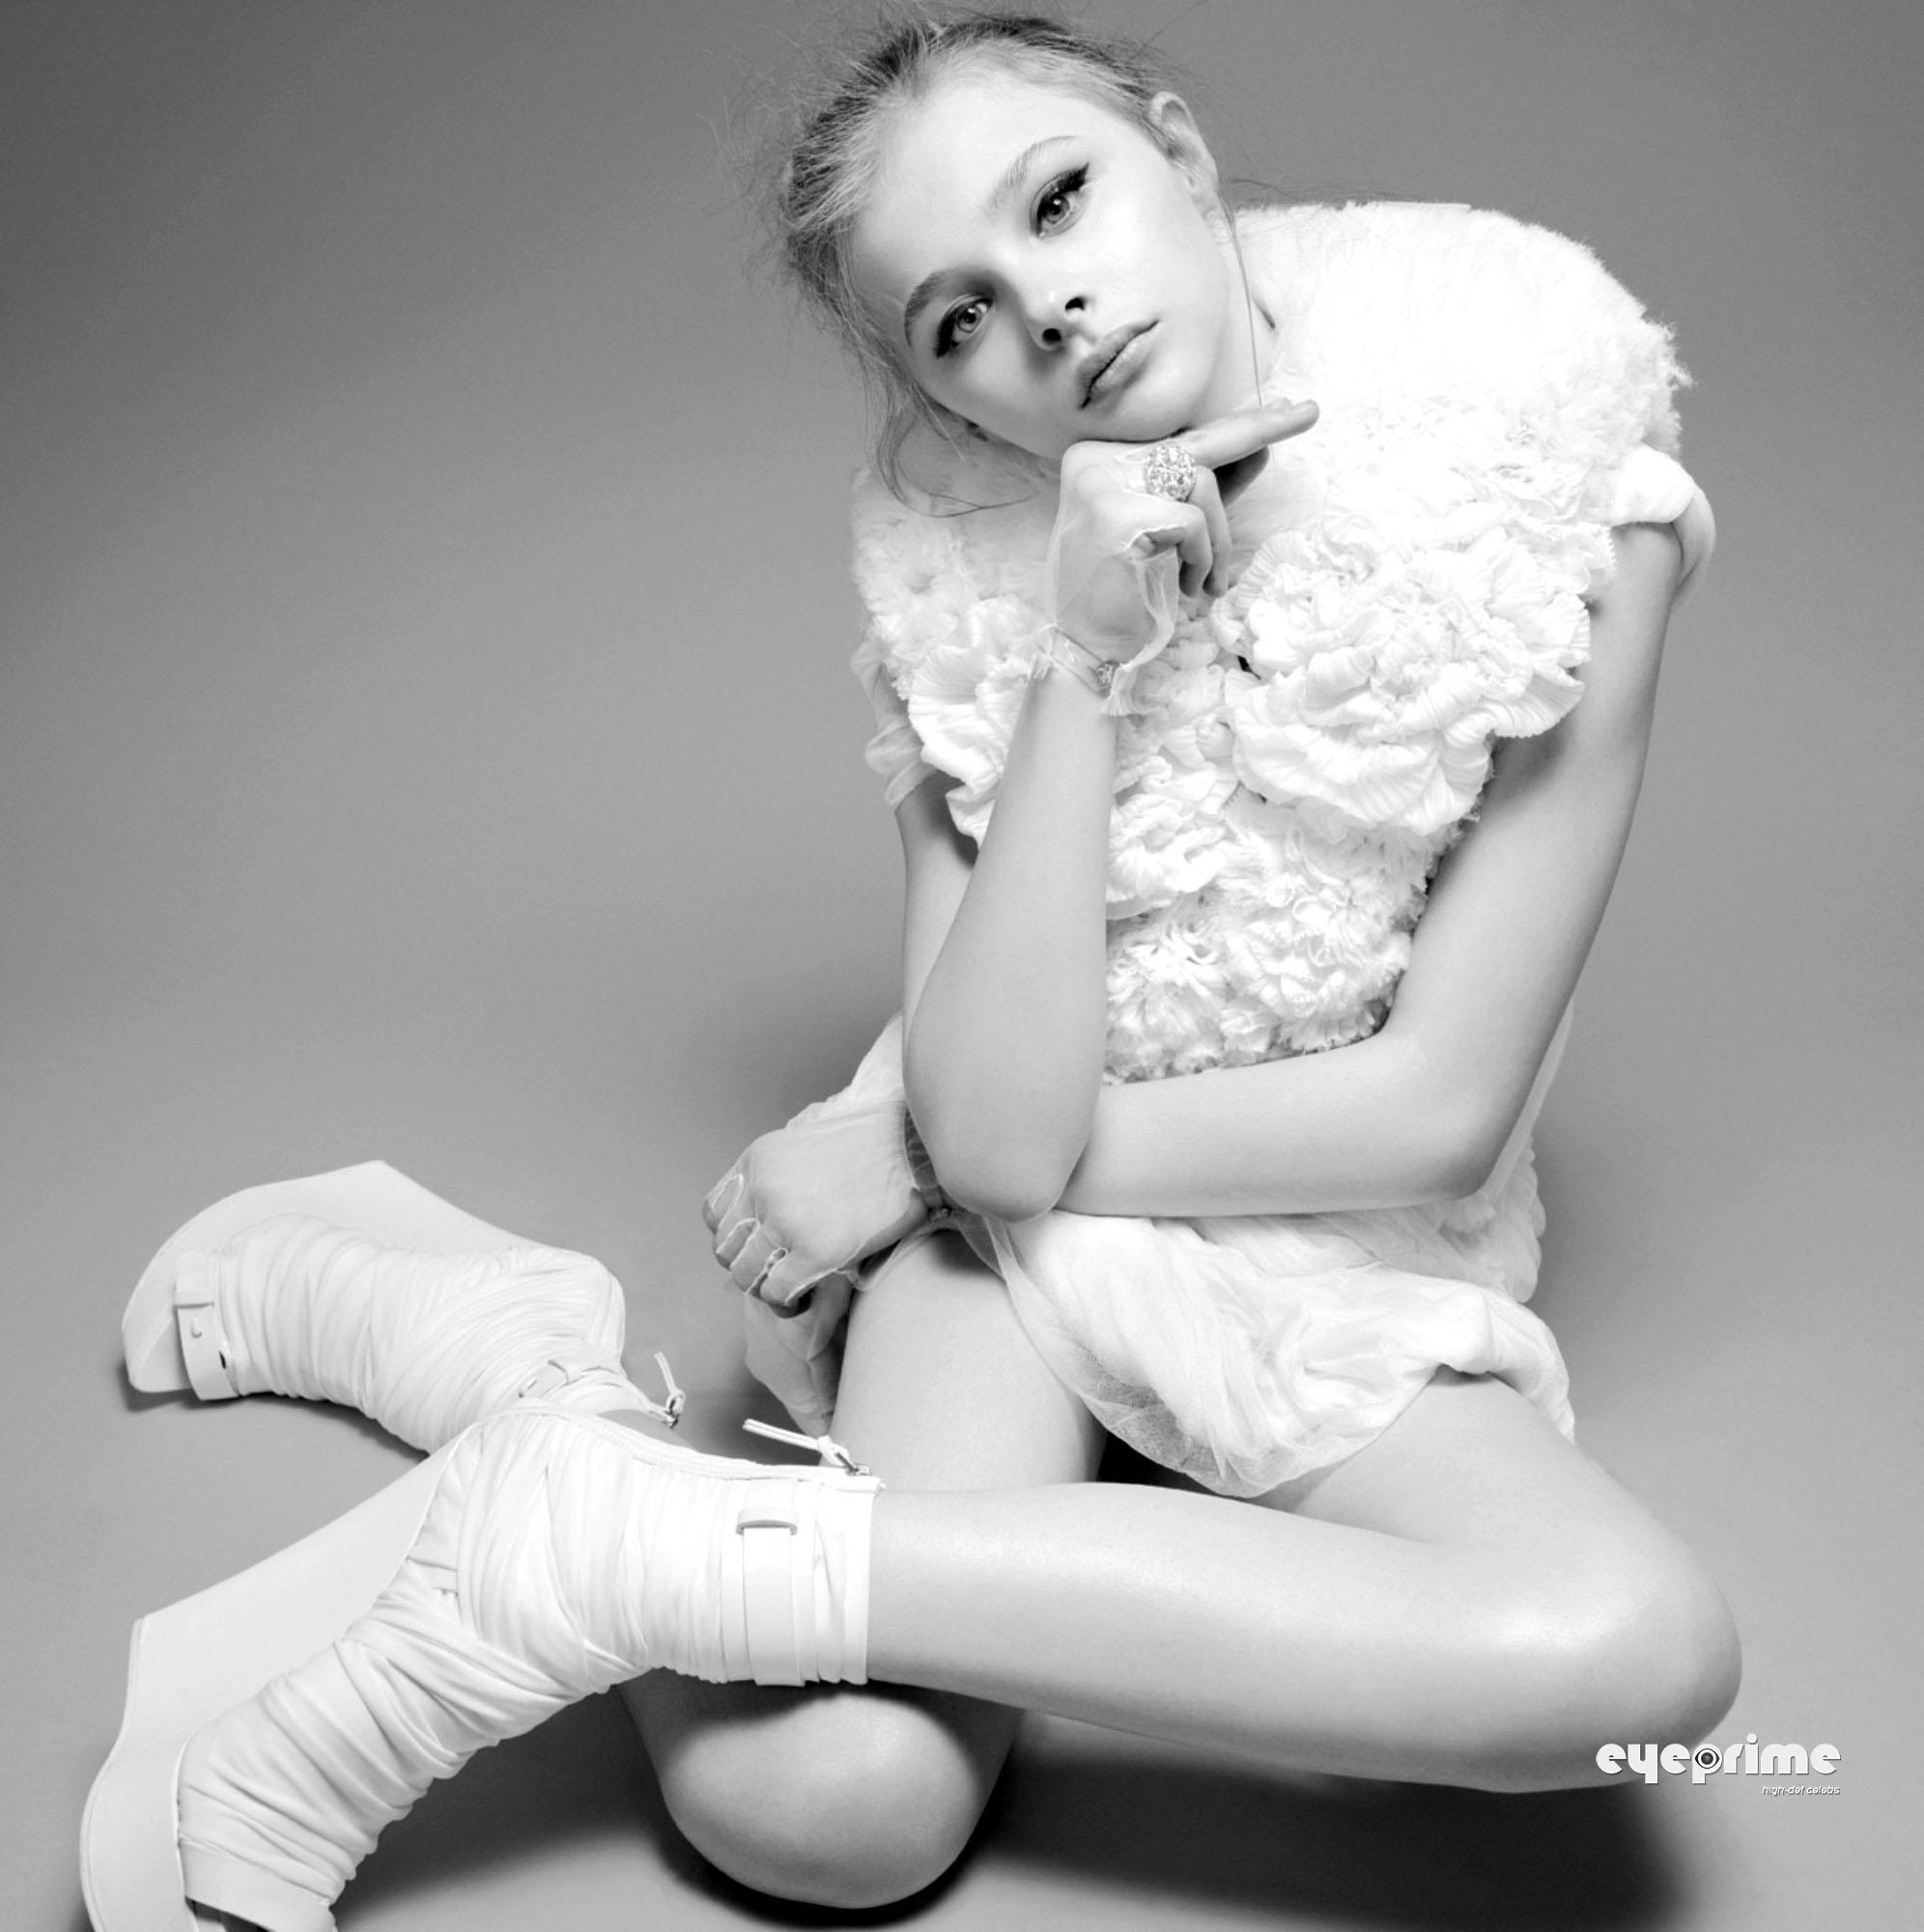 Chloe Moretz - Picture Hot